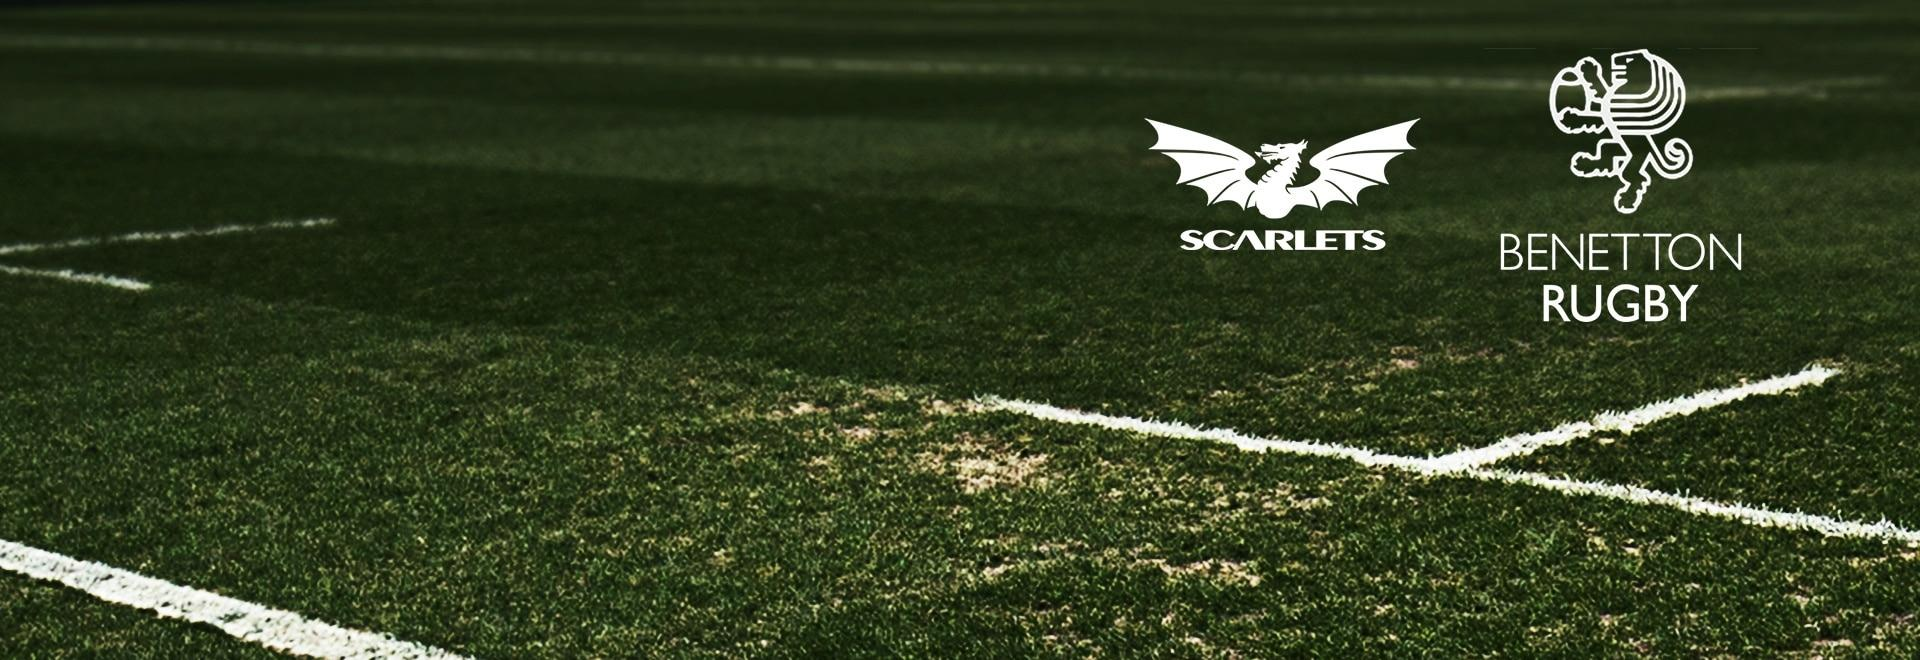 Scarlets - Treviso